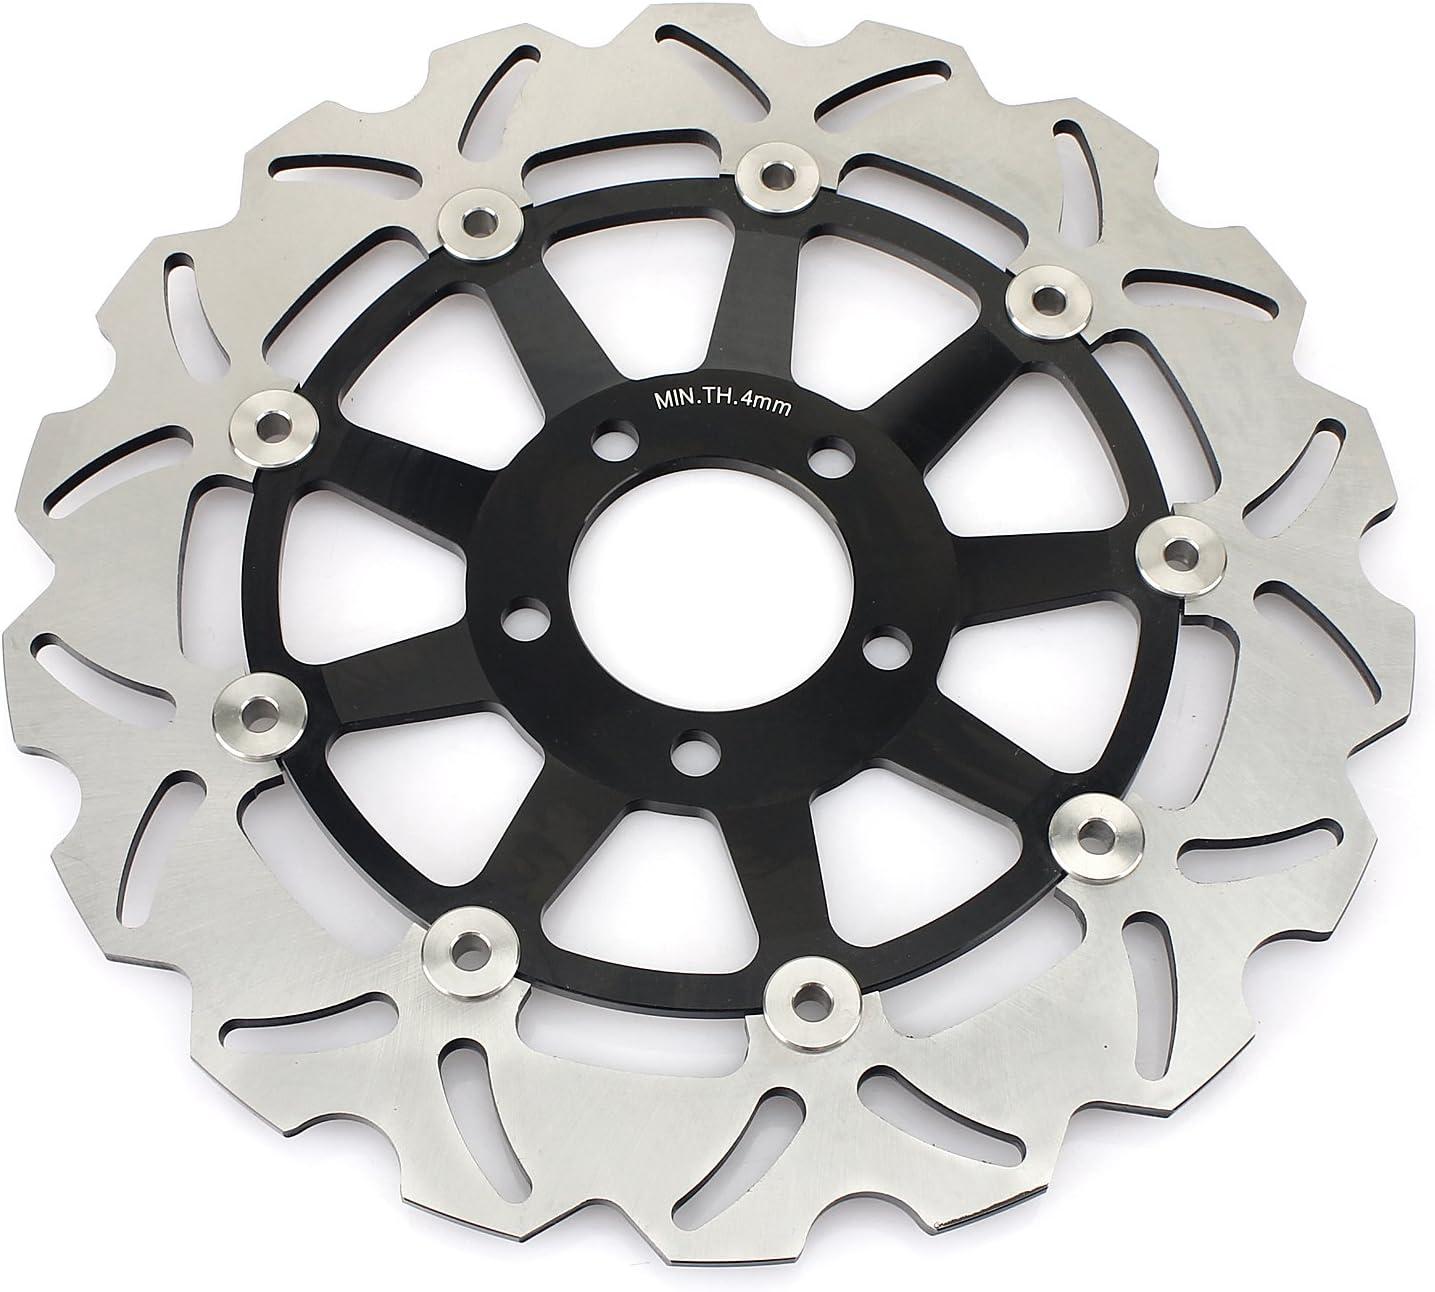 TARAZON Front and Rear Brake Rotors Discs for Kawasaki Ninja ZX12R 04 05 06 //ZX6R 1995-1997//ZR 750 Zephyr